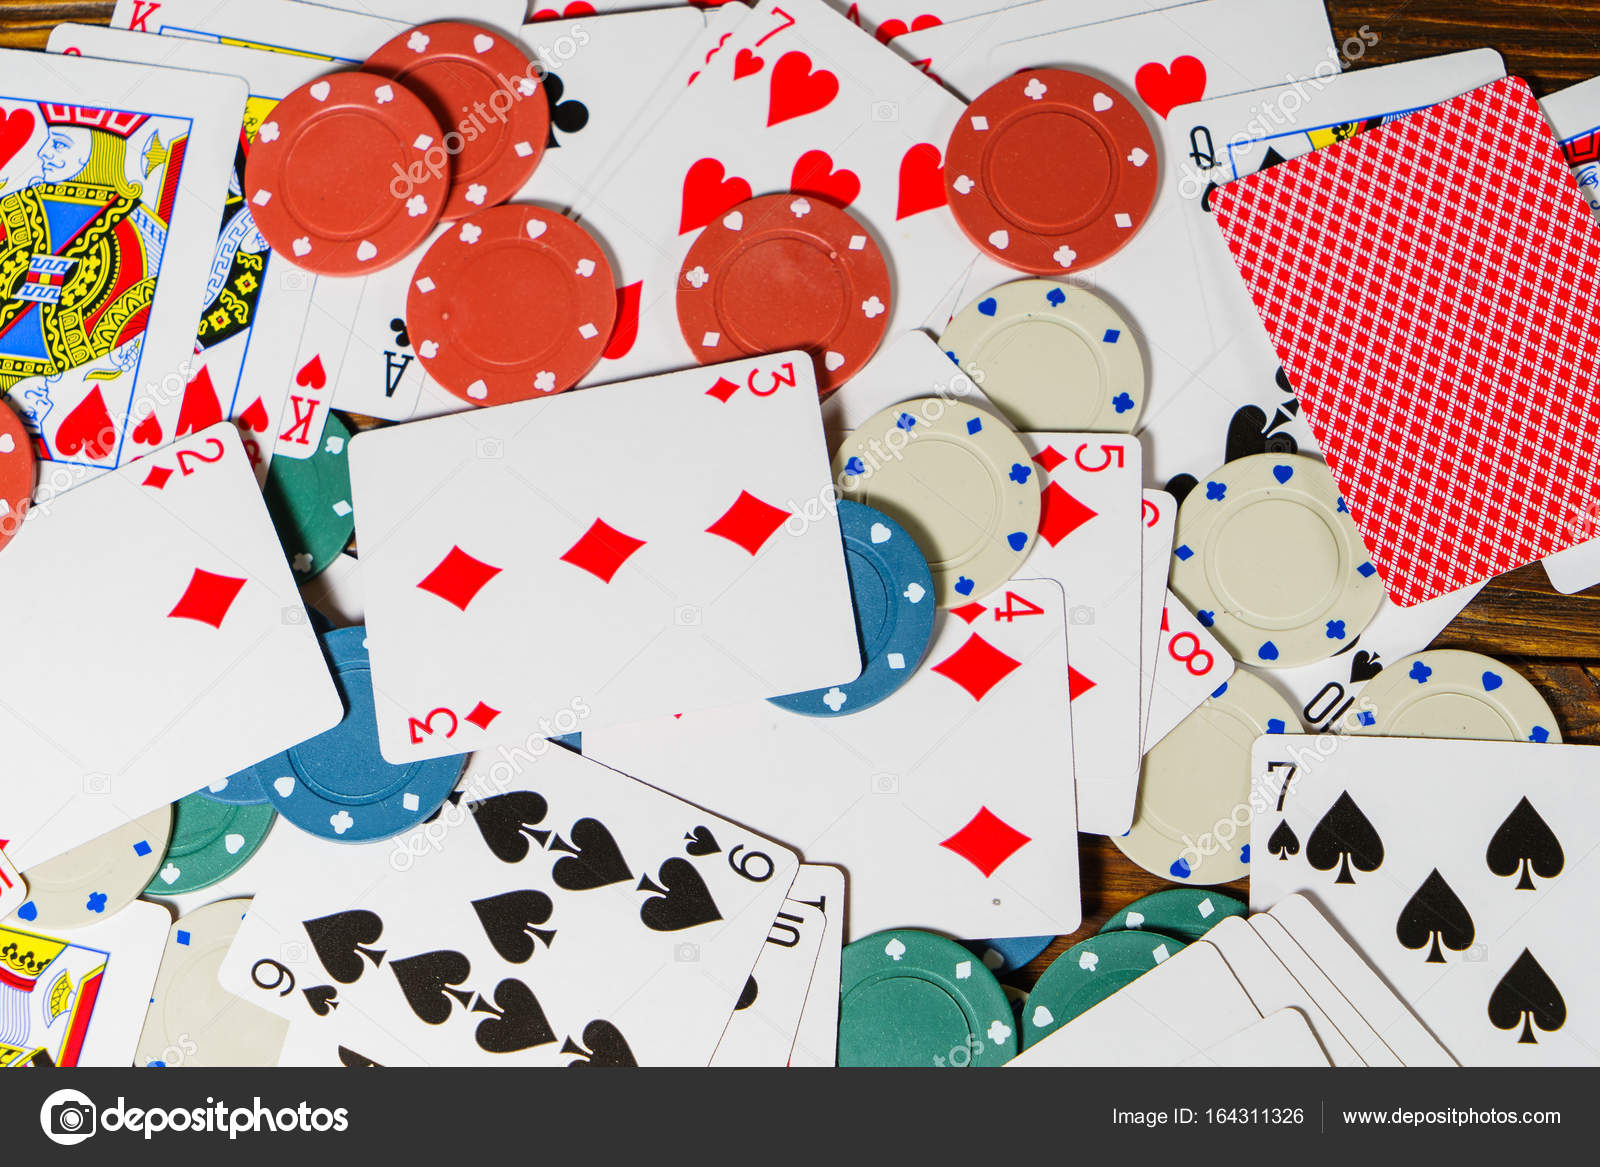 Bilder zum thema poker casino valence sud adresse